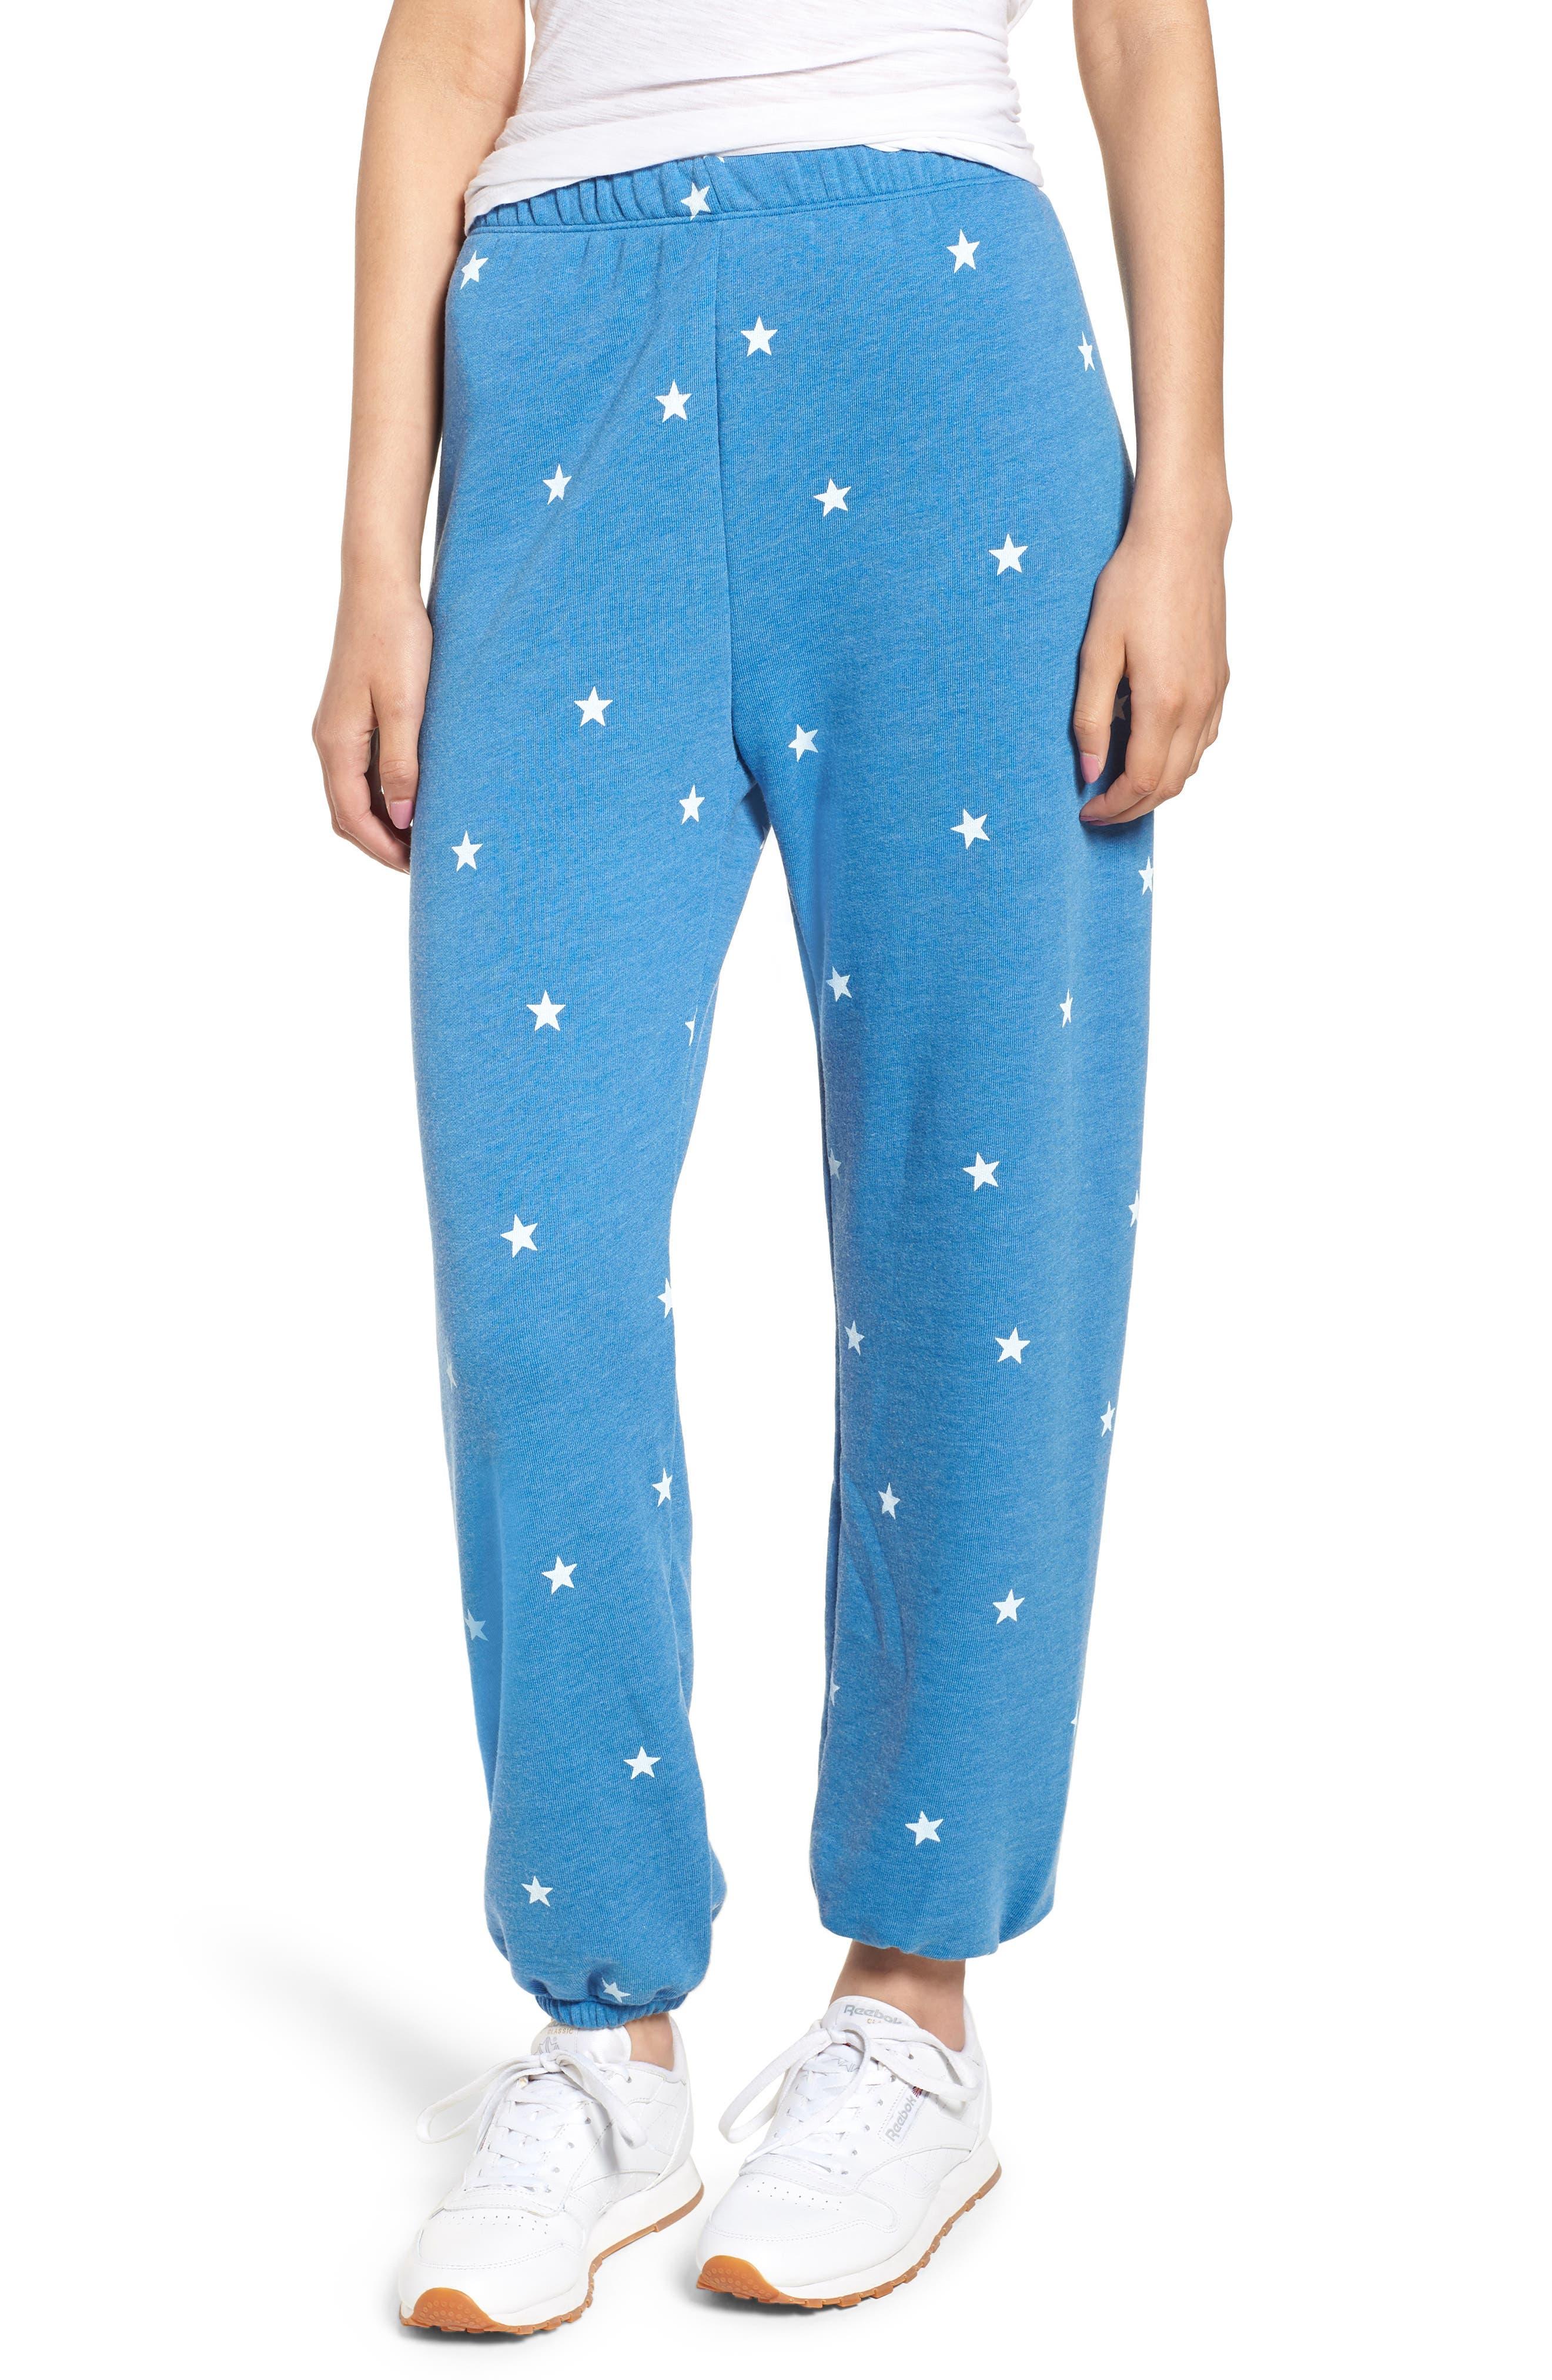 Football Star Easy Sweatpants,                         Main,                         color, 400